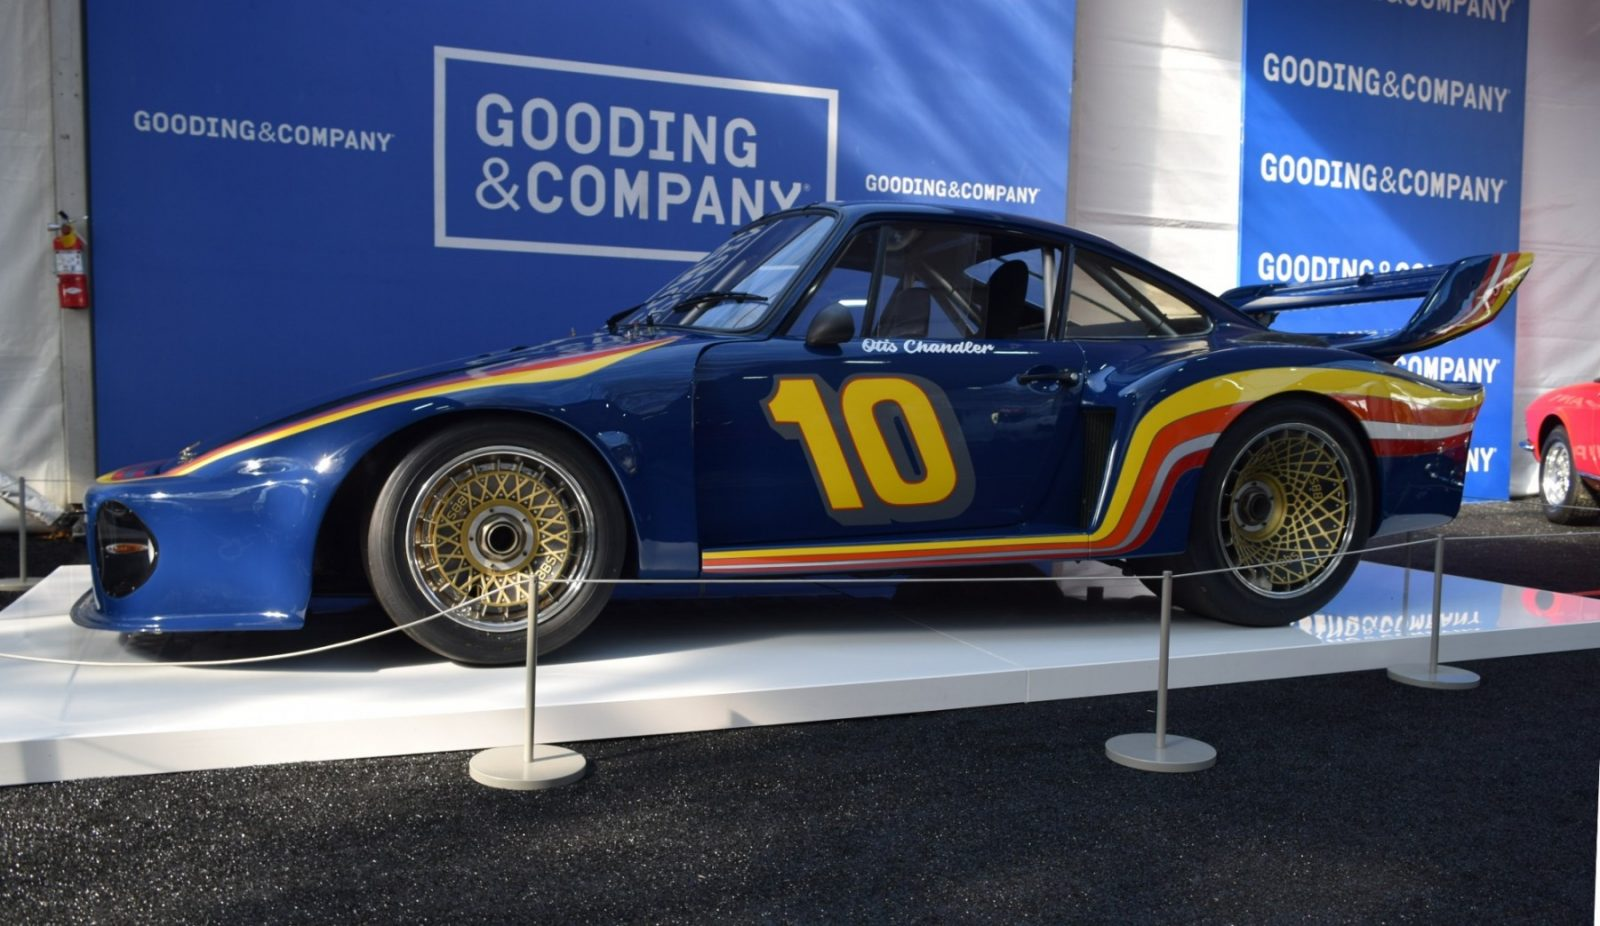 1979 Porsche 935 - Gooding Amelia 20193